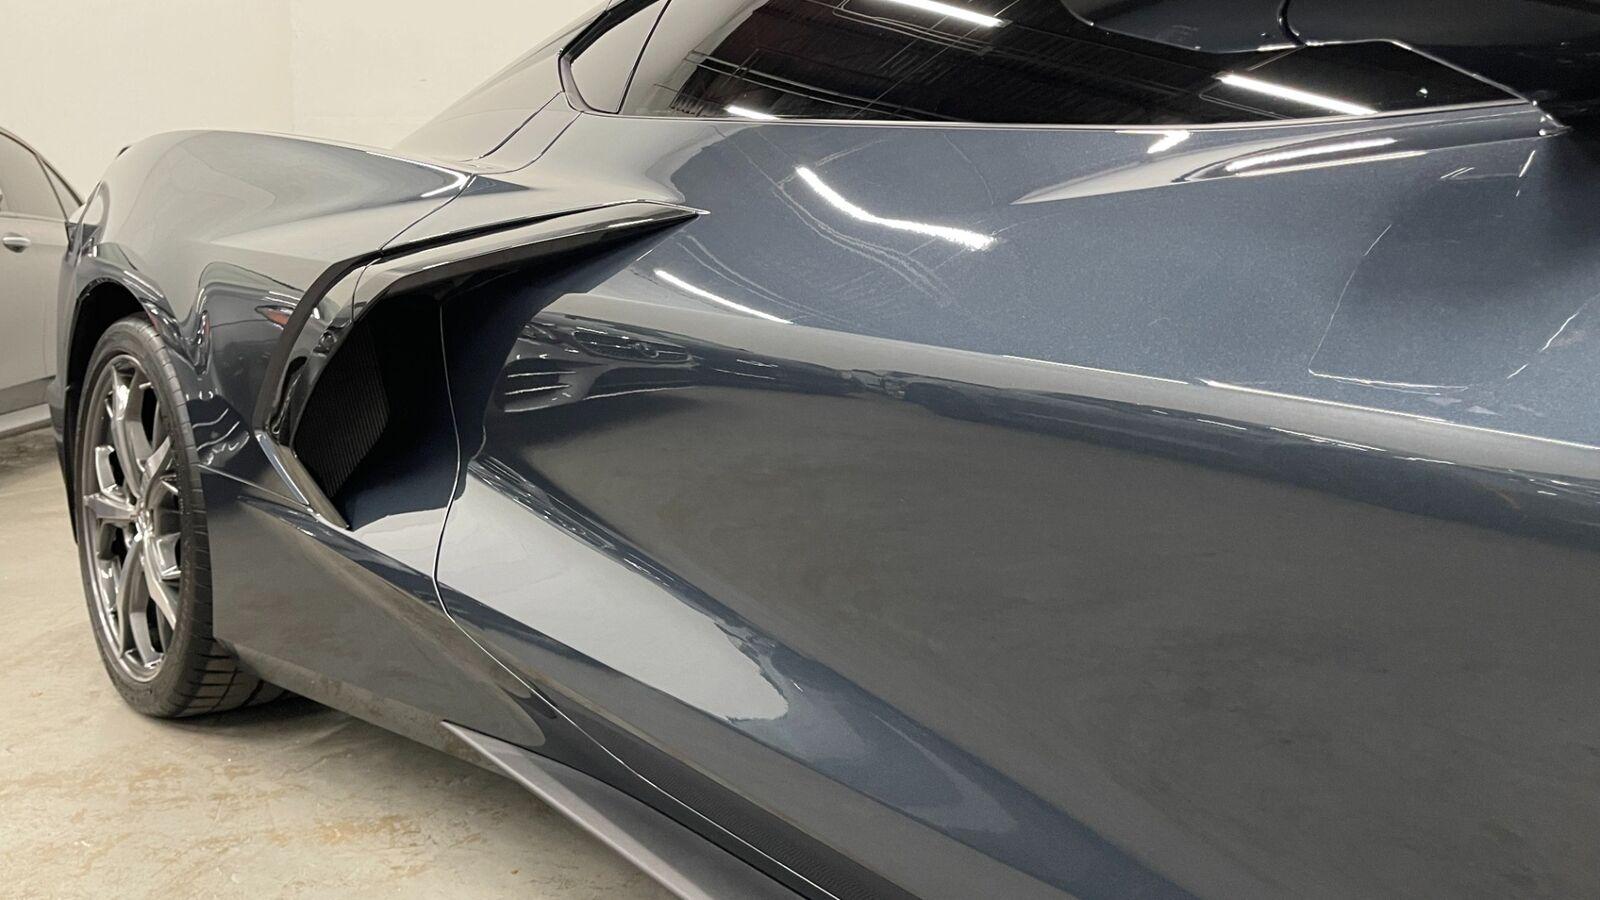 2020 Gray Chevrolet Corvette Stingray 1LT | C7 Corvette Photo 5